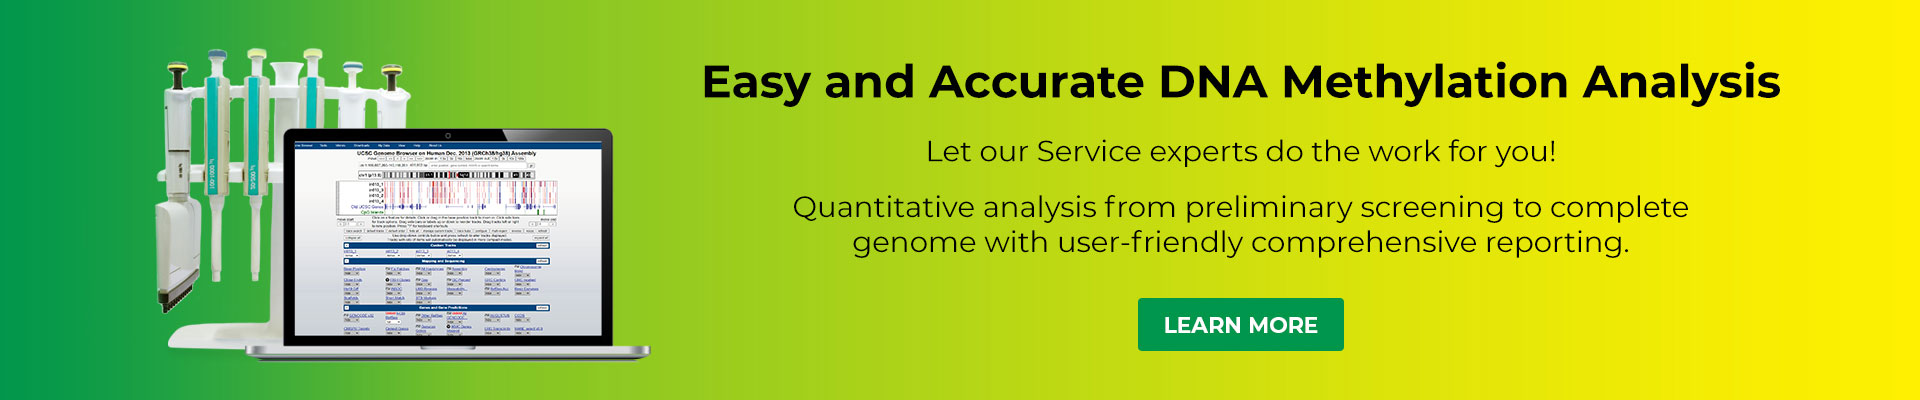 DNA Methylation Service Banner